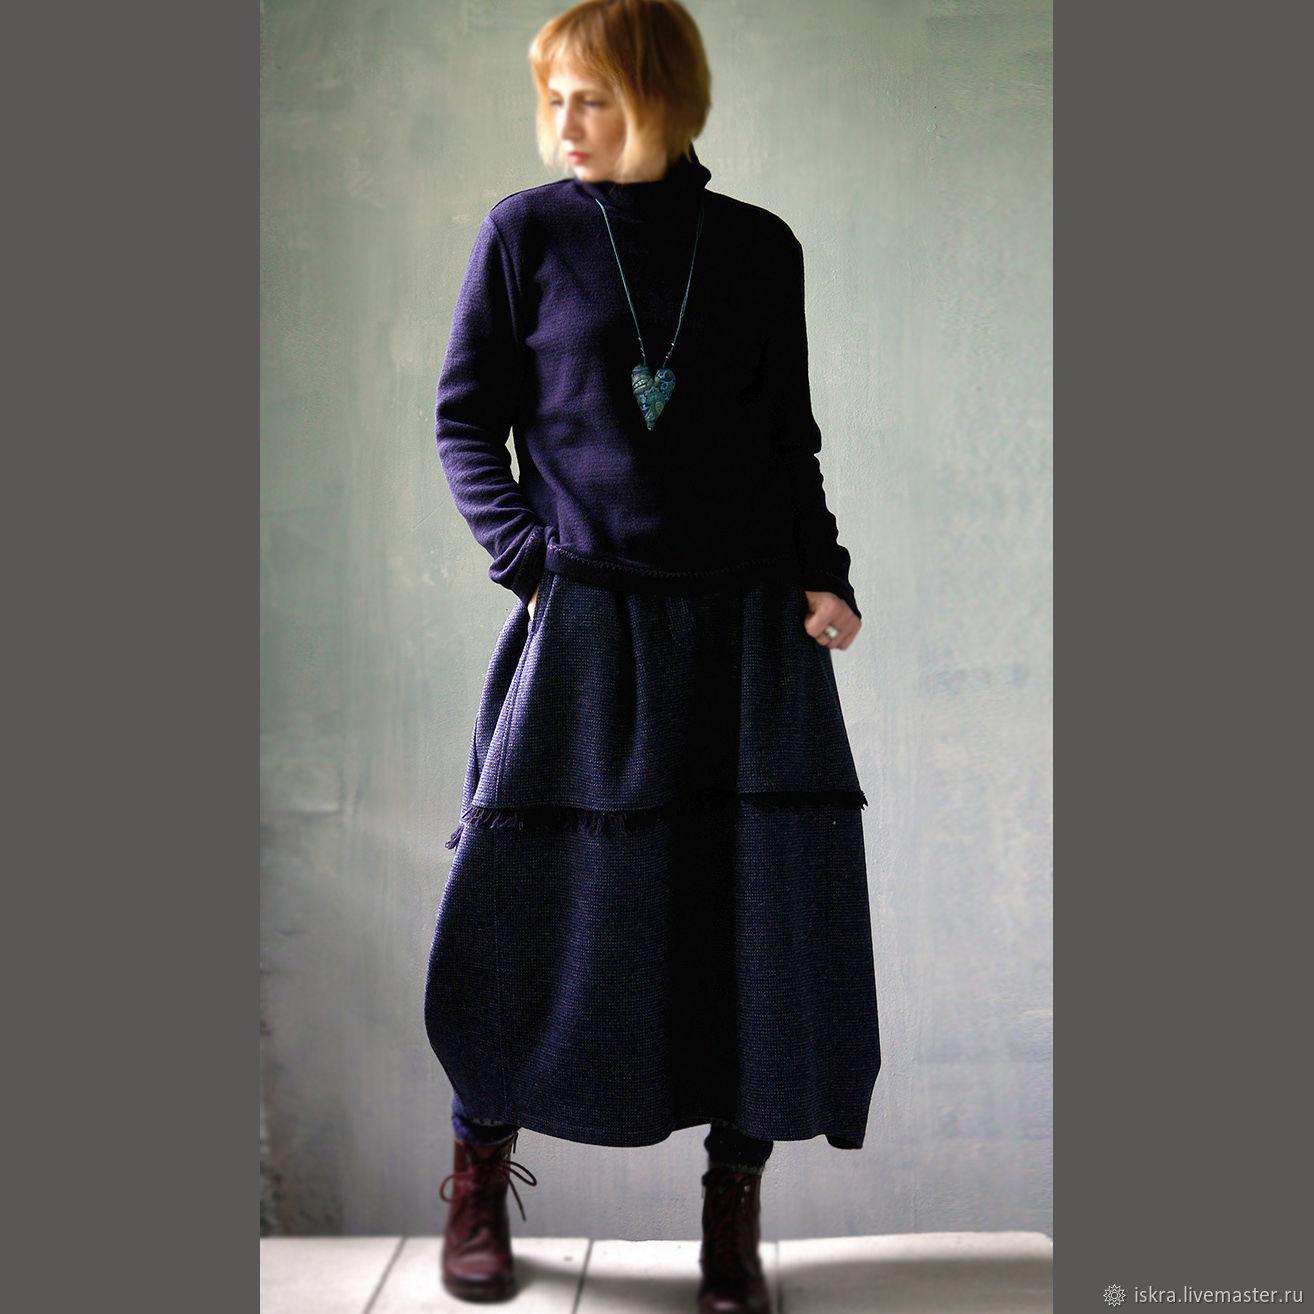 Теплая шерстяная юбка, Юбки, Москва,  Фото №1